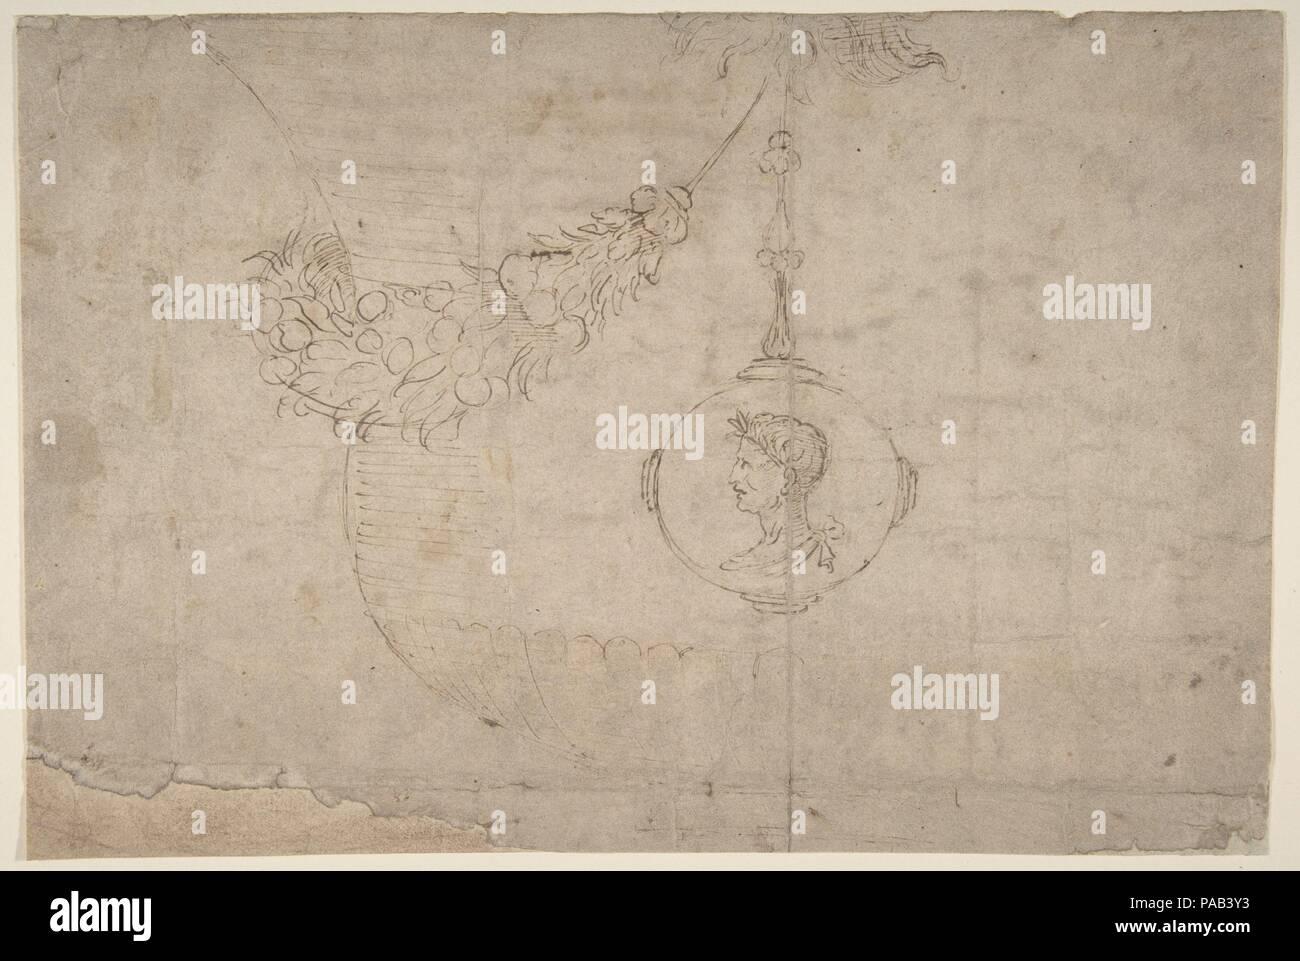 1496 After Imágenes De Stock & 1496 After Fotos De Stock - Alamy